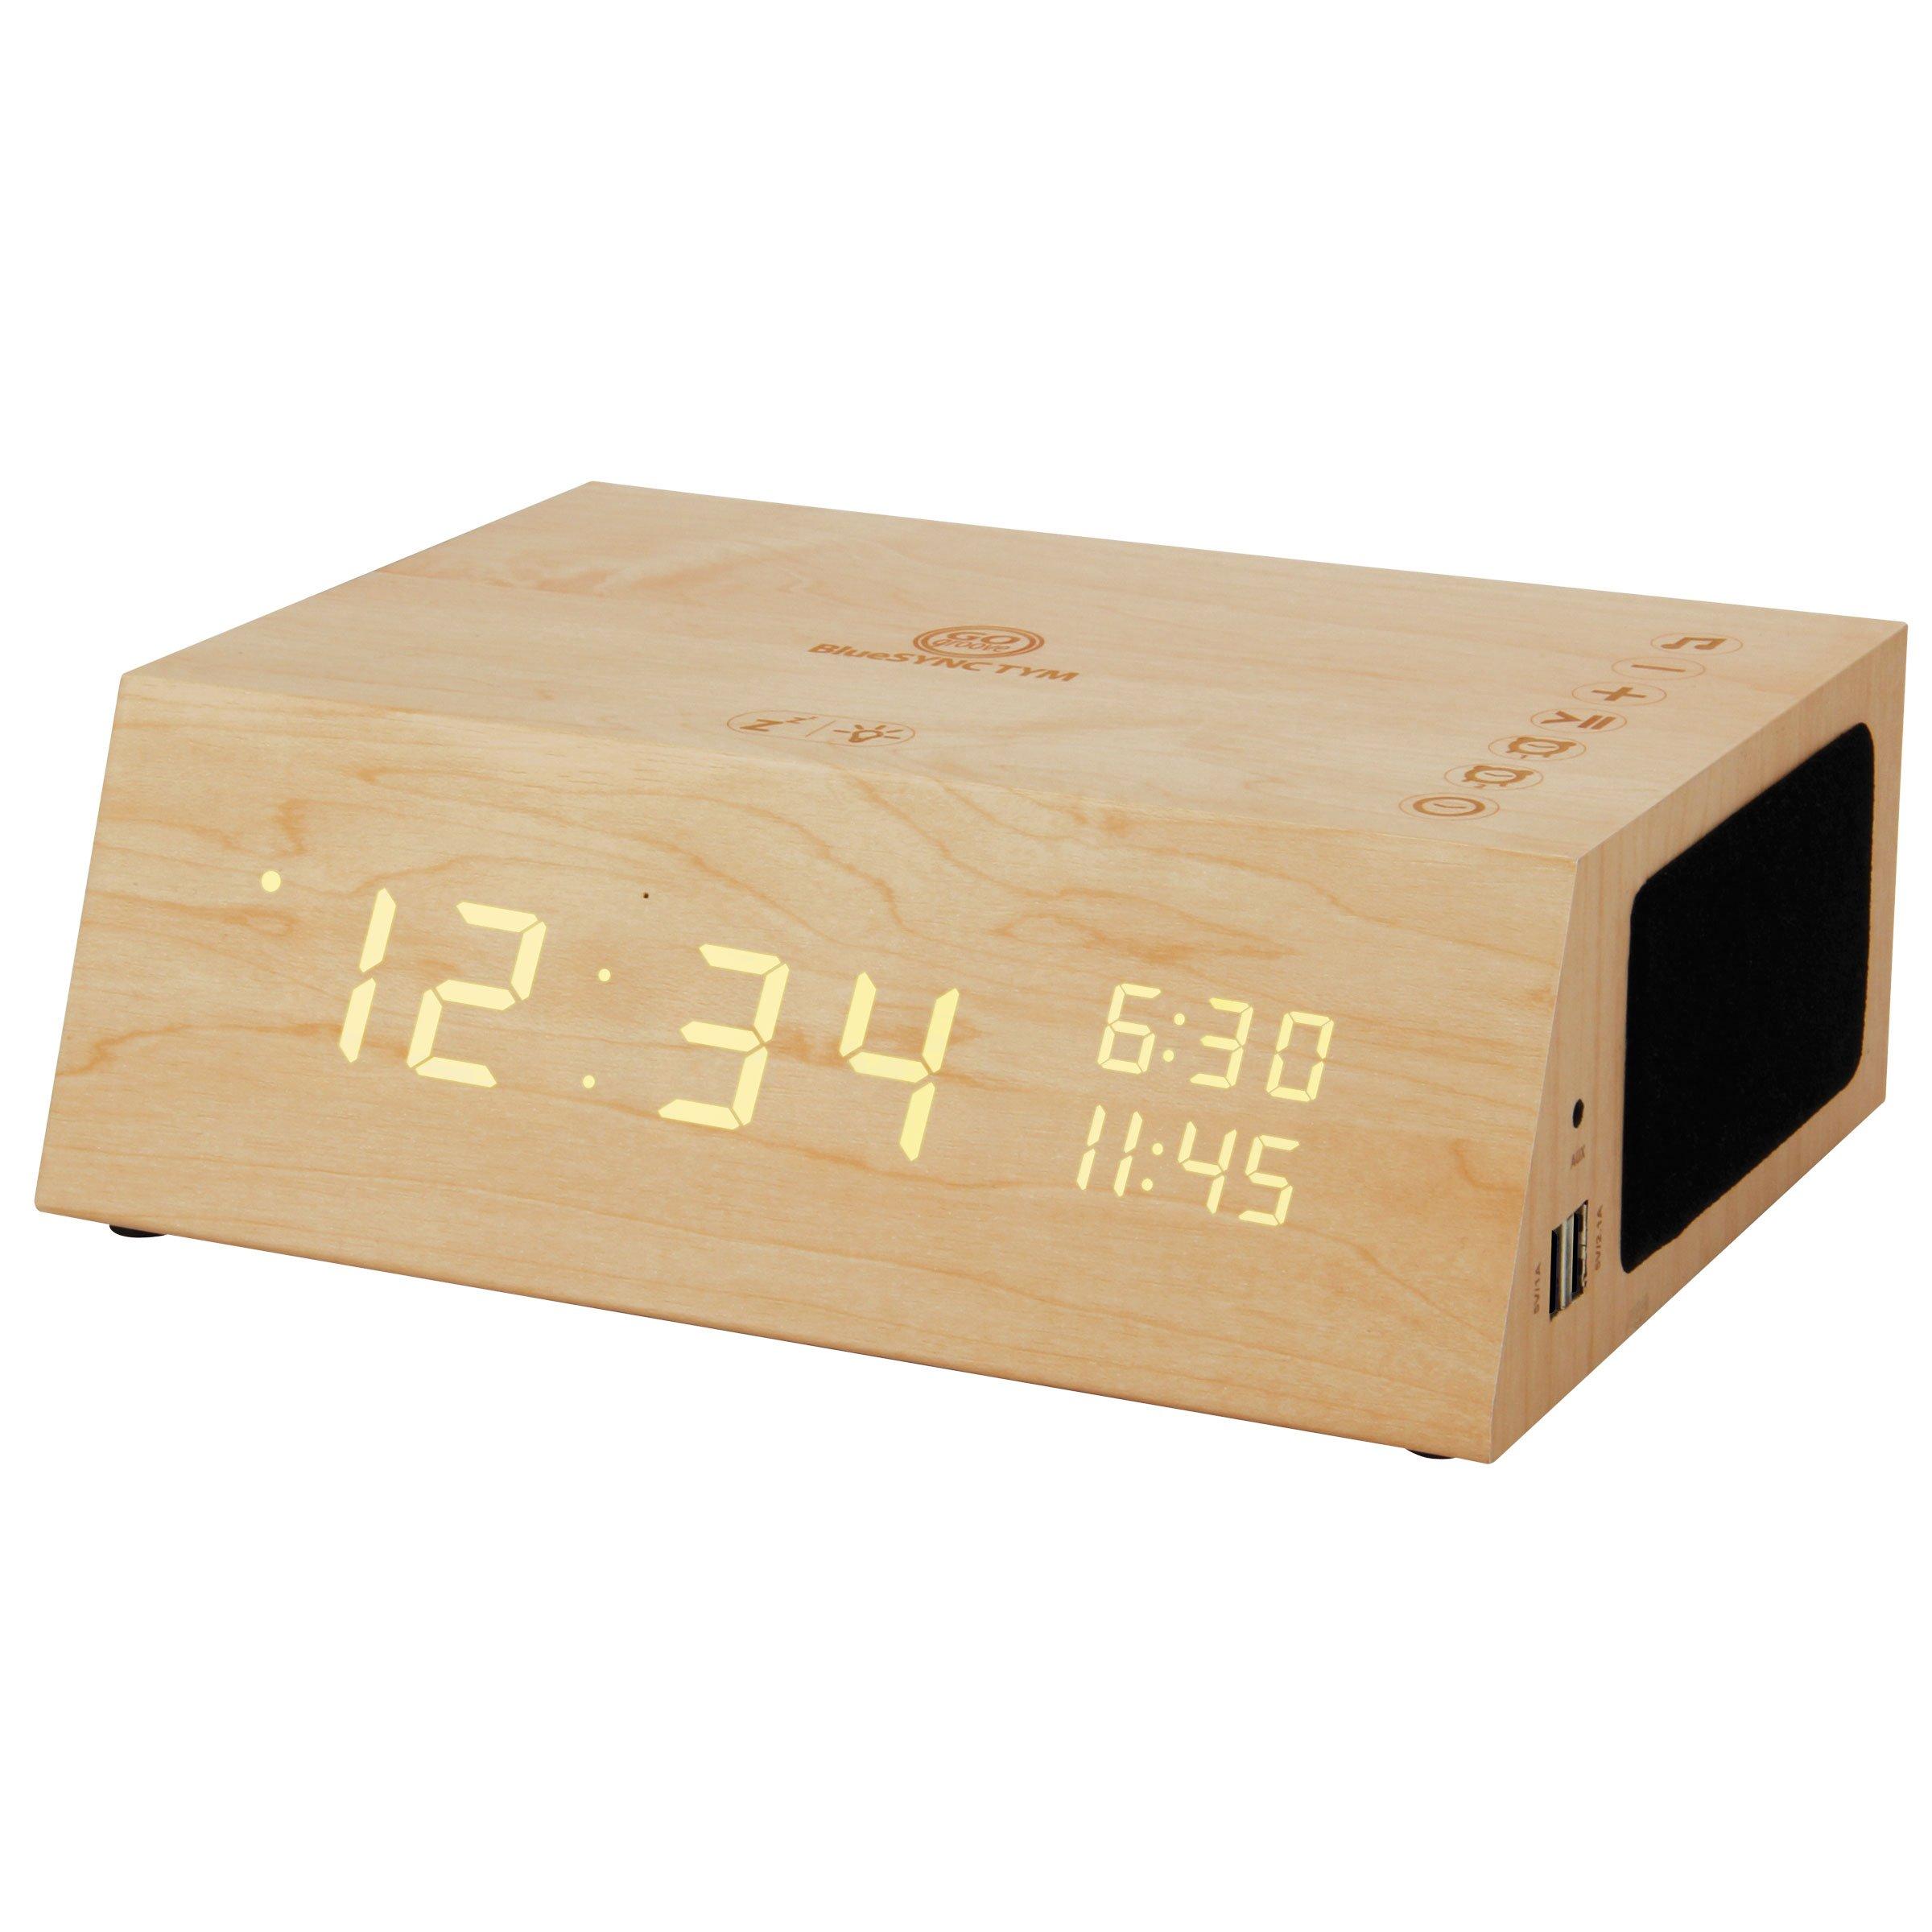 GOgroove Alarm Clock Radio Bluetooth Speaker TYM+ [2018 Edition] Wood Digital Alarm Clock LED with FM Radio, Battery Backup, USB Phone Charging Ports, 3.5mm AUX, Built-in Mic (Light Finish)